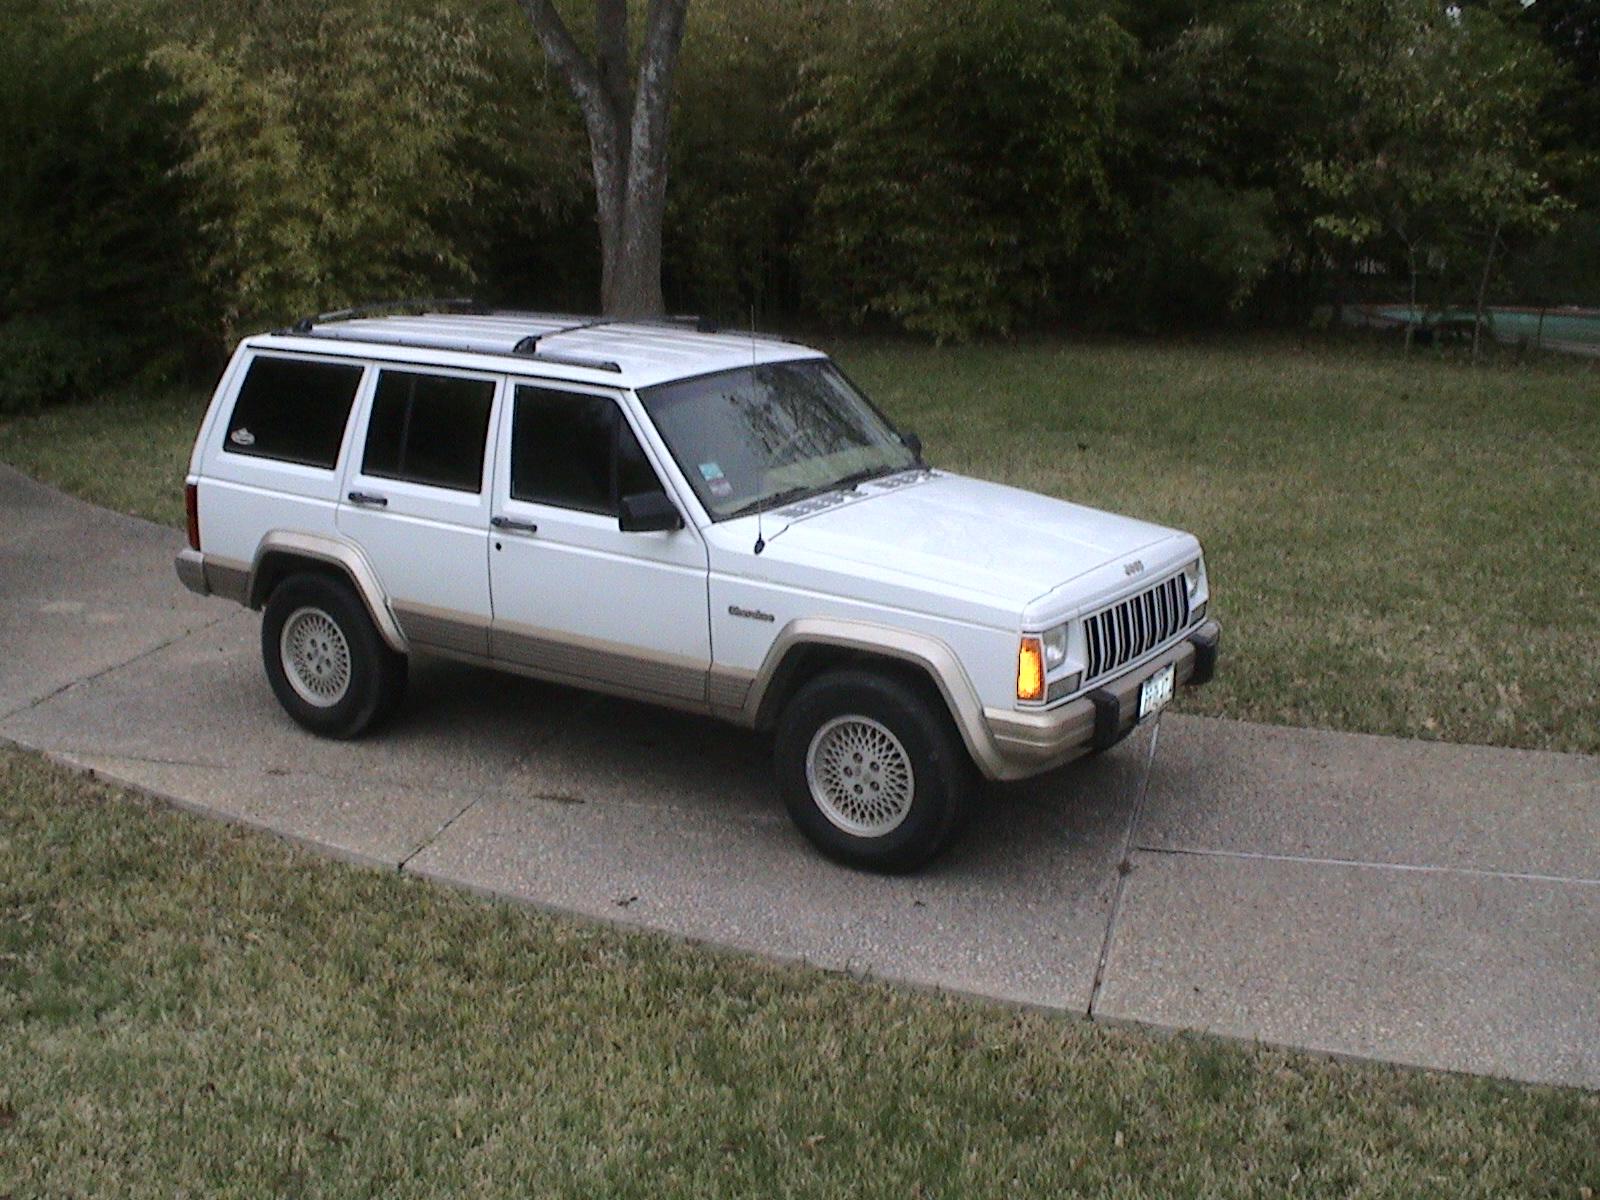 93 jeep cherokee whitedsc01403